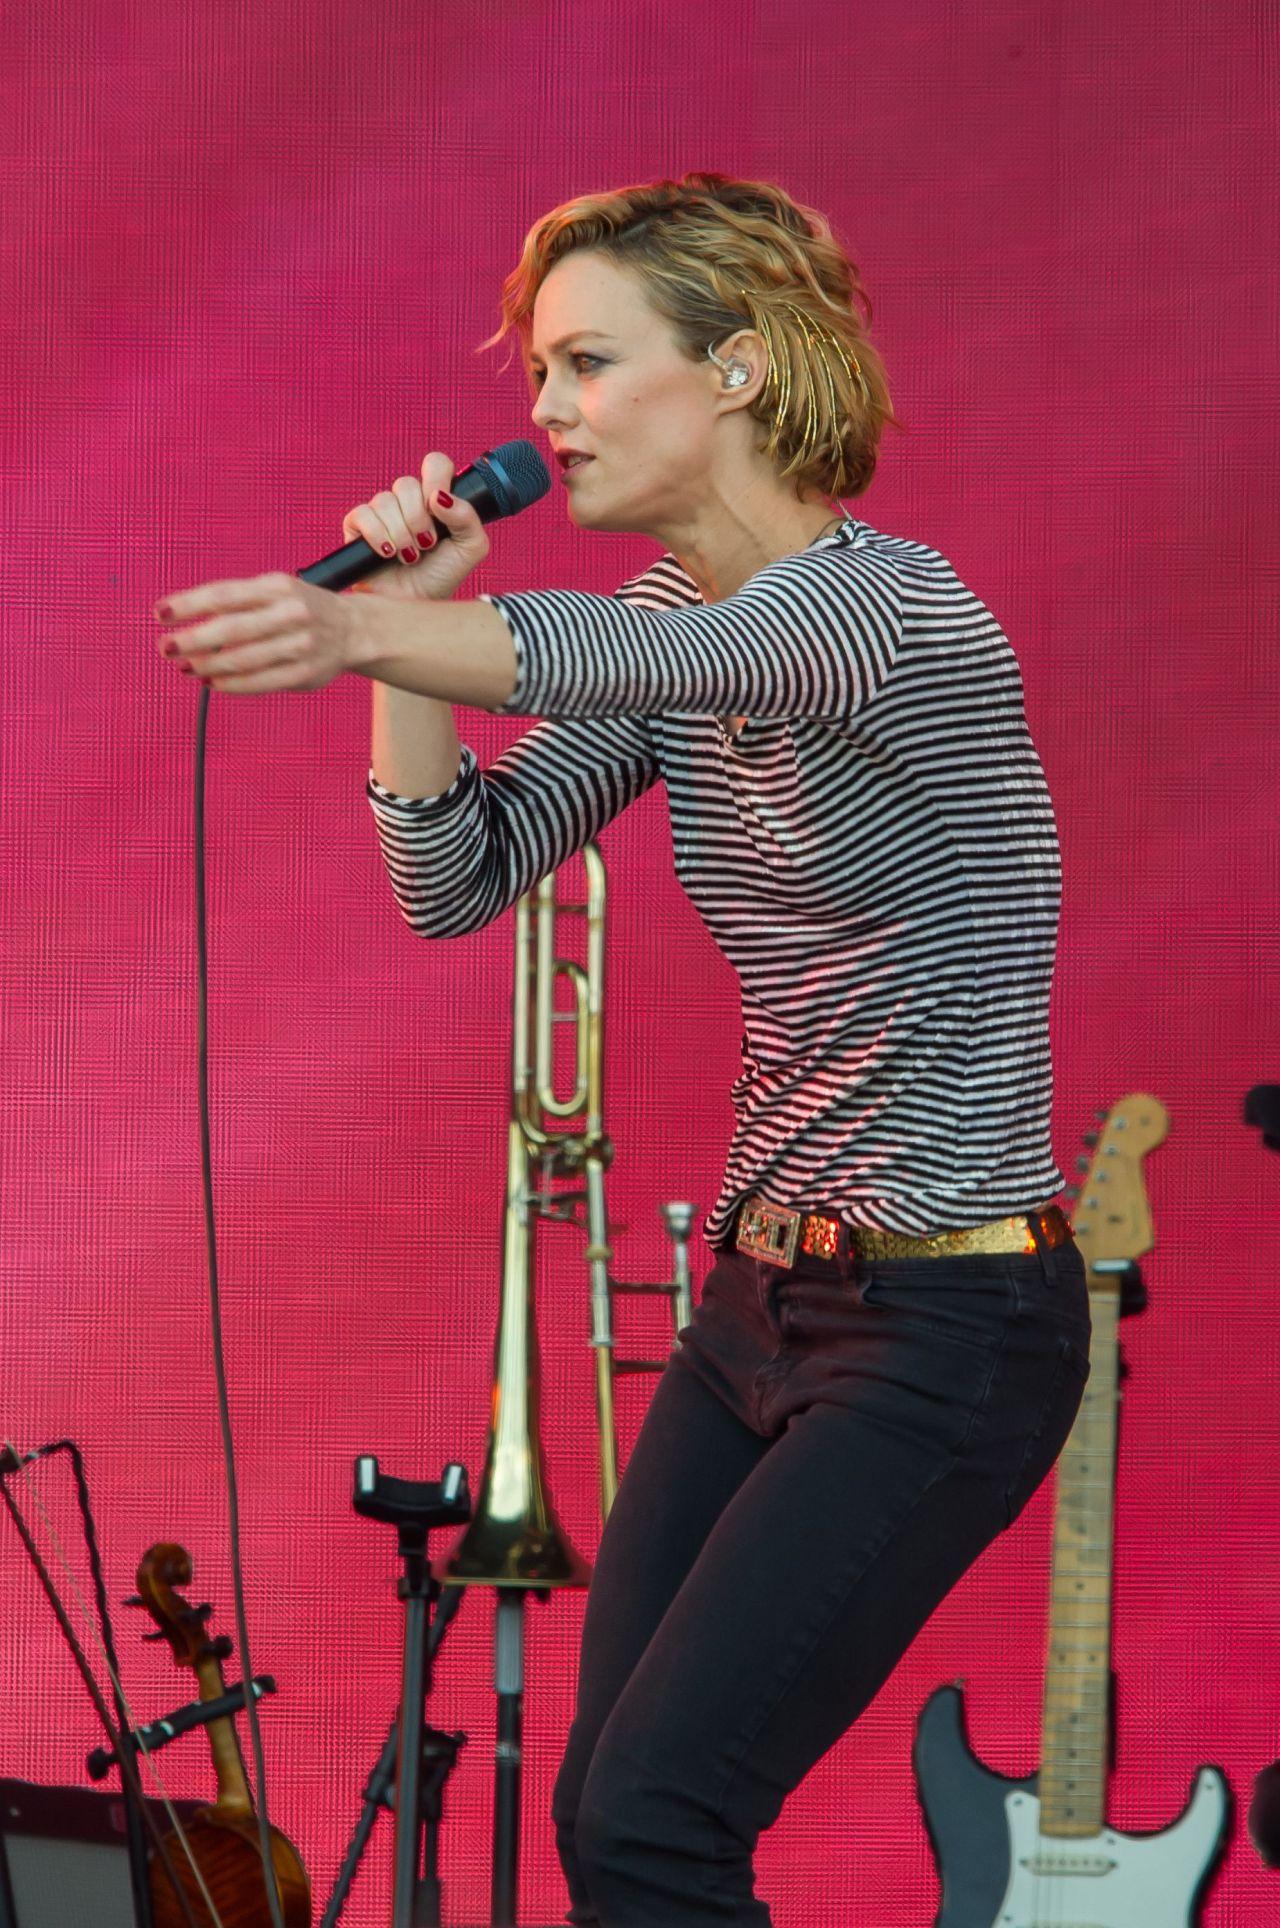 Vanessa Paradis Performing at Solidays in Paris - June 2014